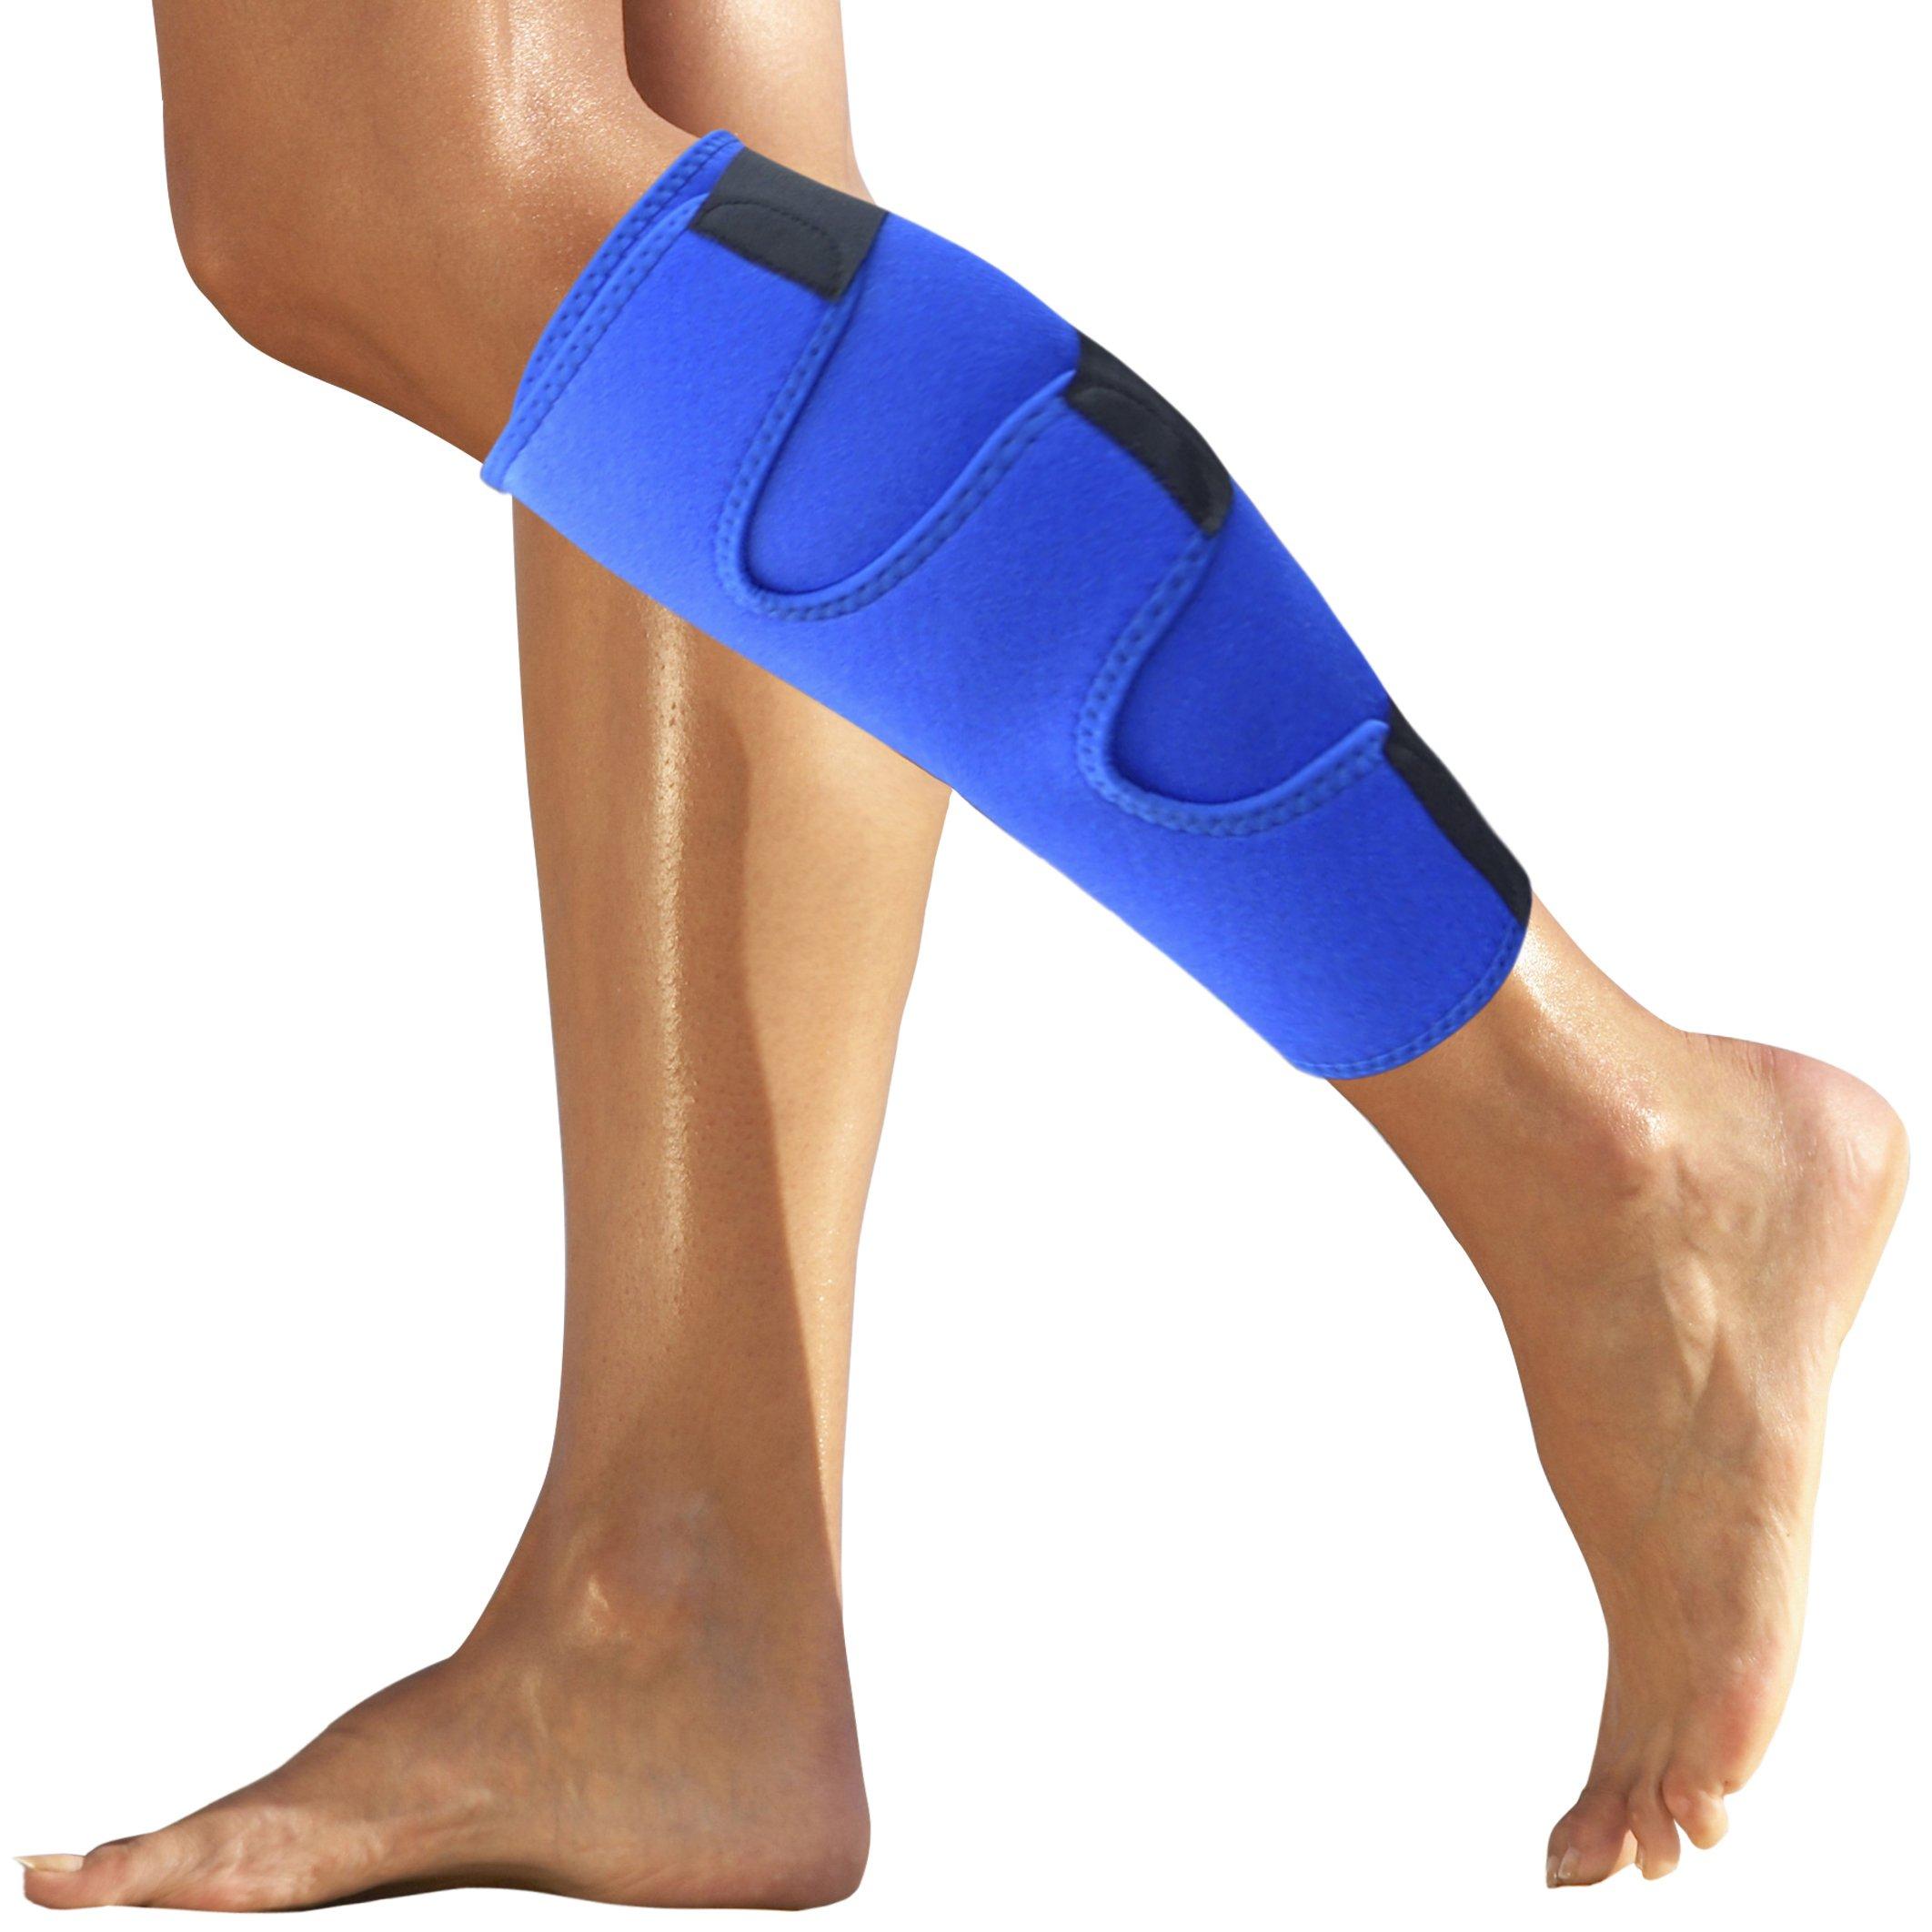 Calf Brace - Shin Splint Support for Calf Pain Relief, Strain, Sprain, Shin Splints, Tennis Leg, Calf Injury. Best Compression Lower Leg Brace for Men and Women. Calf Wrap - Shin Splint Brace / Sleeve